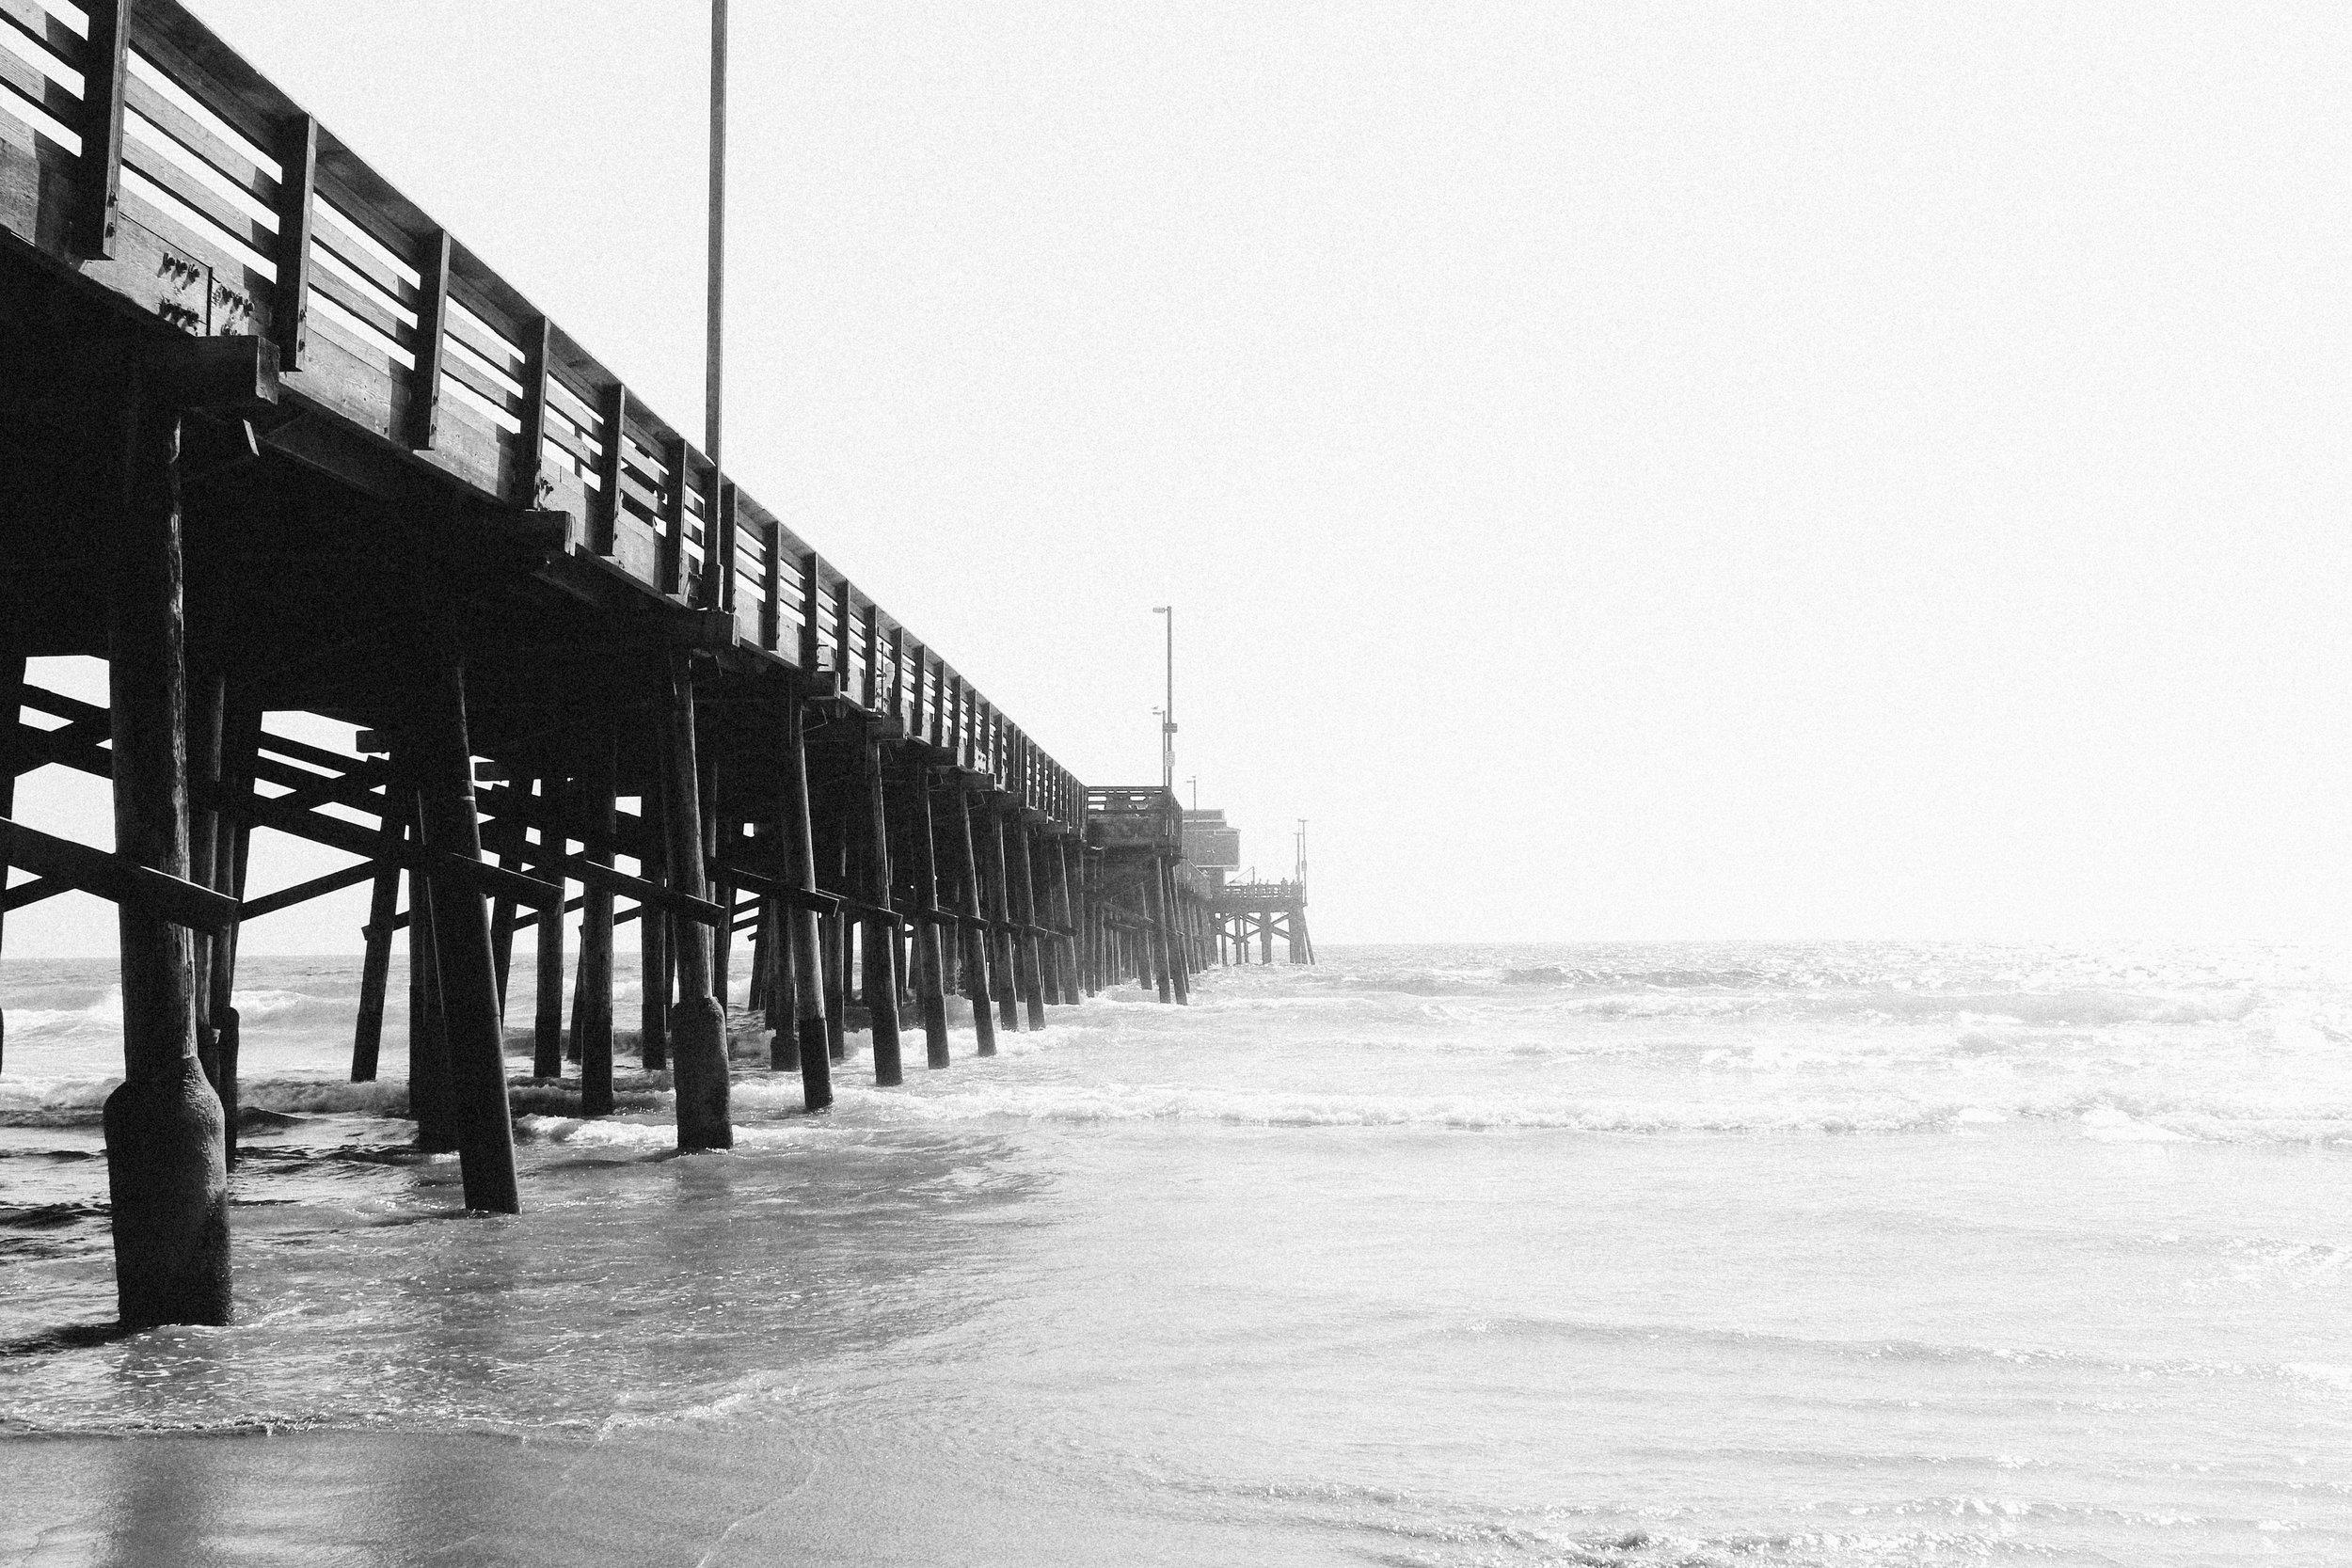 NEWPORT BEACH, CALIFORNIA - TAYLORKRISTIINA.COM